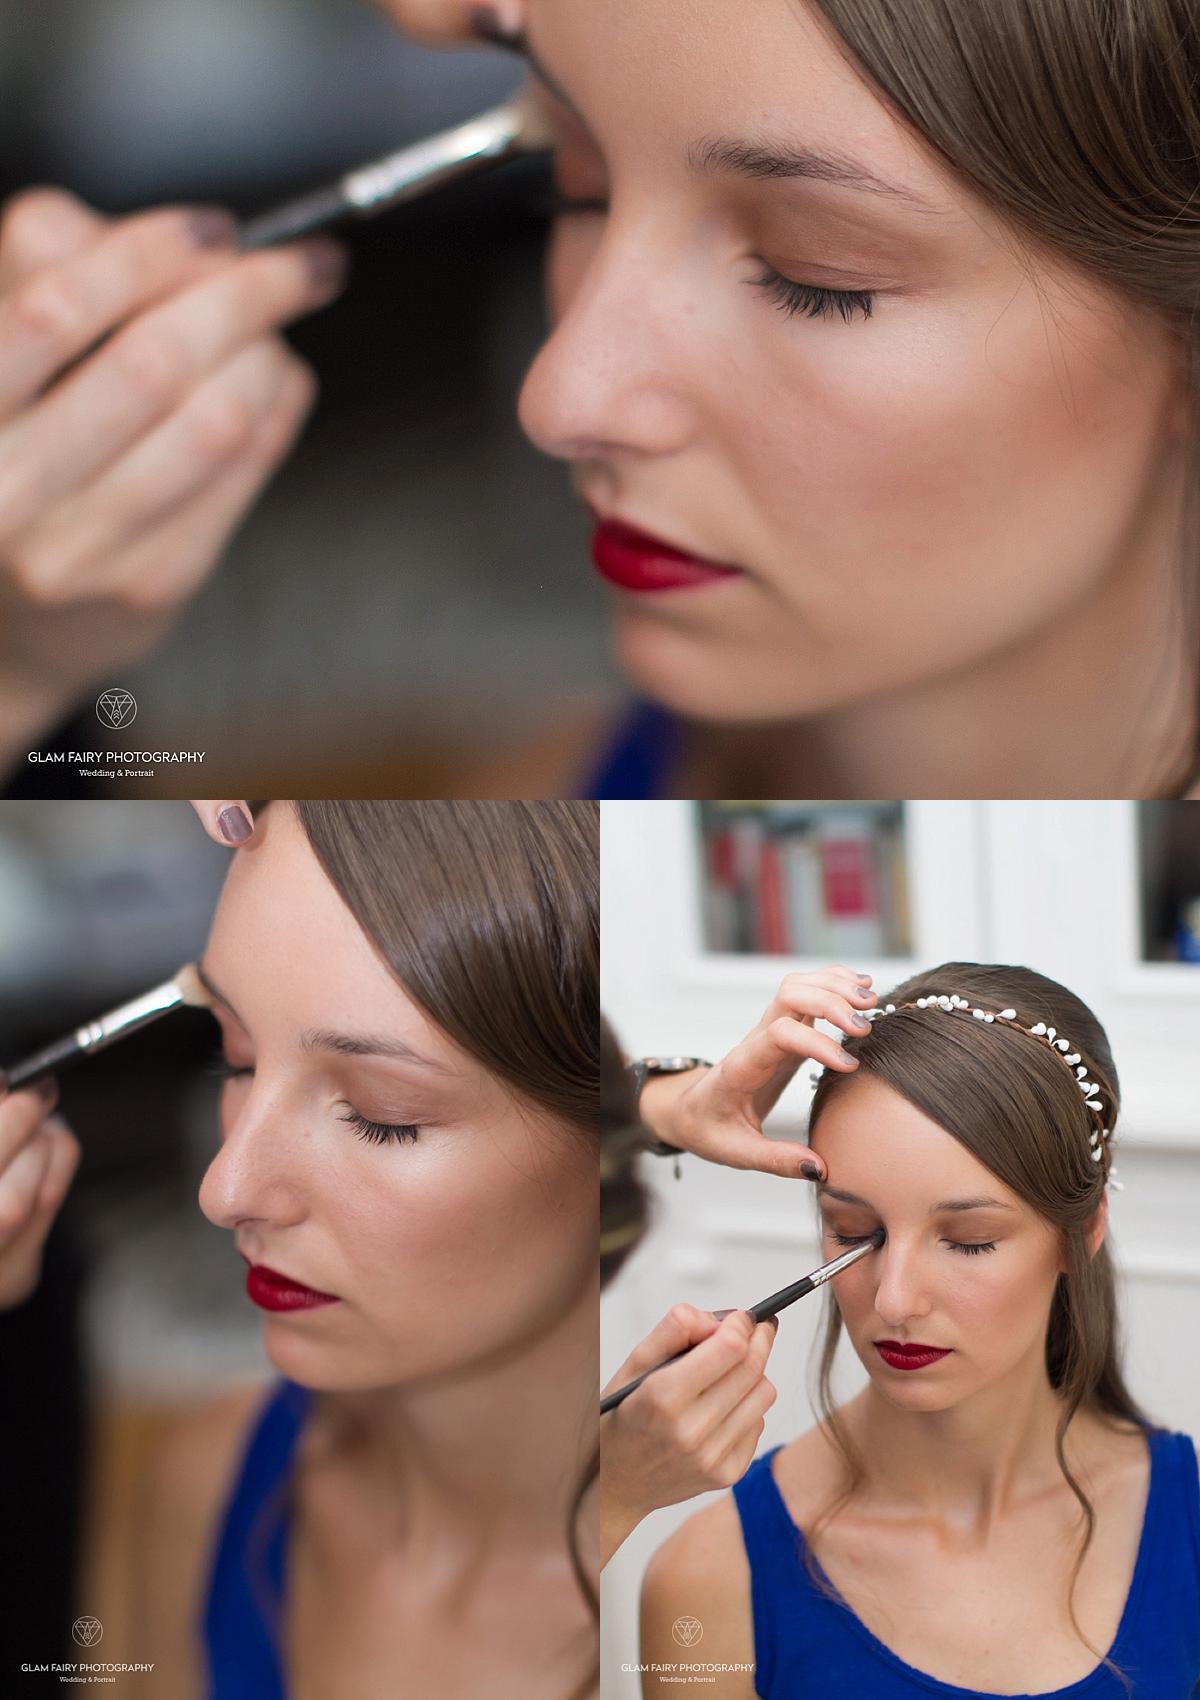 GlamFairyPhotography-sublimer-la-mariee-v4_0012